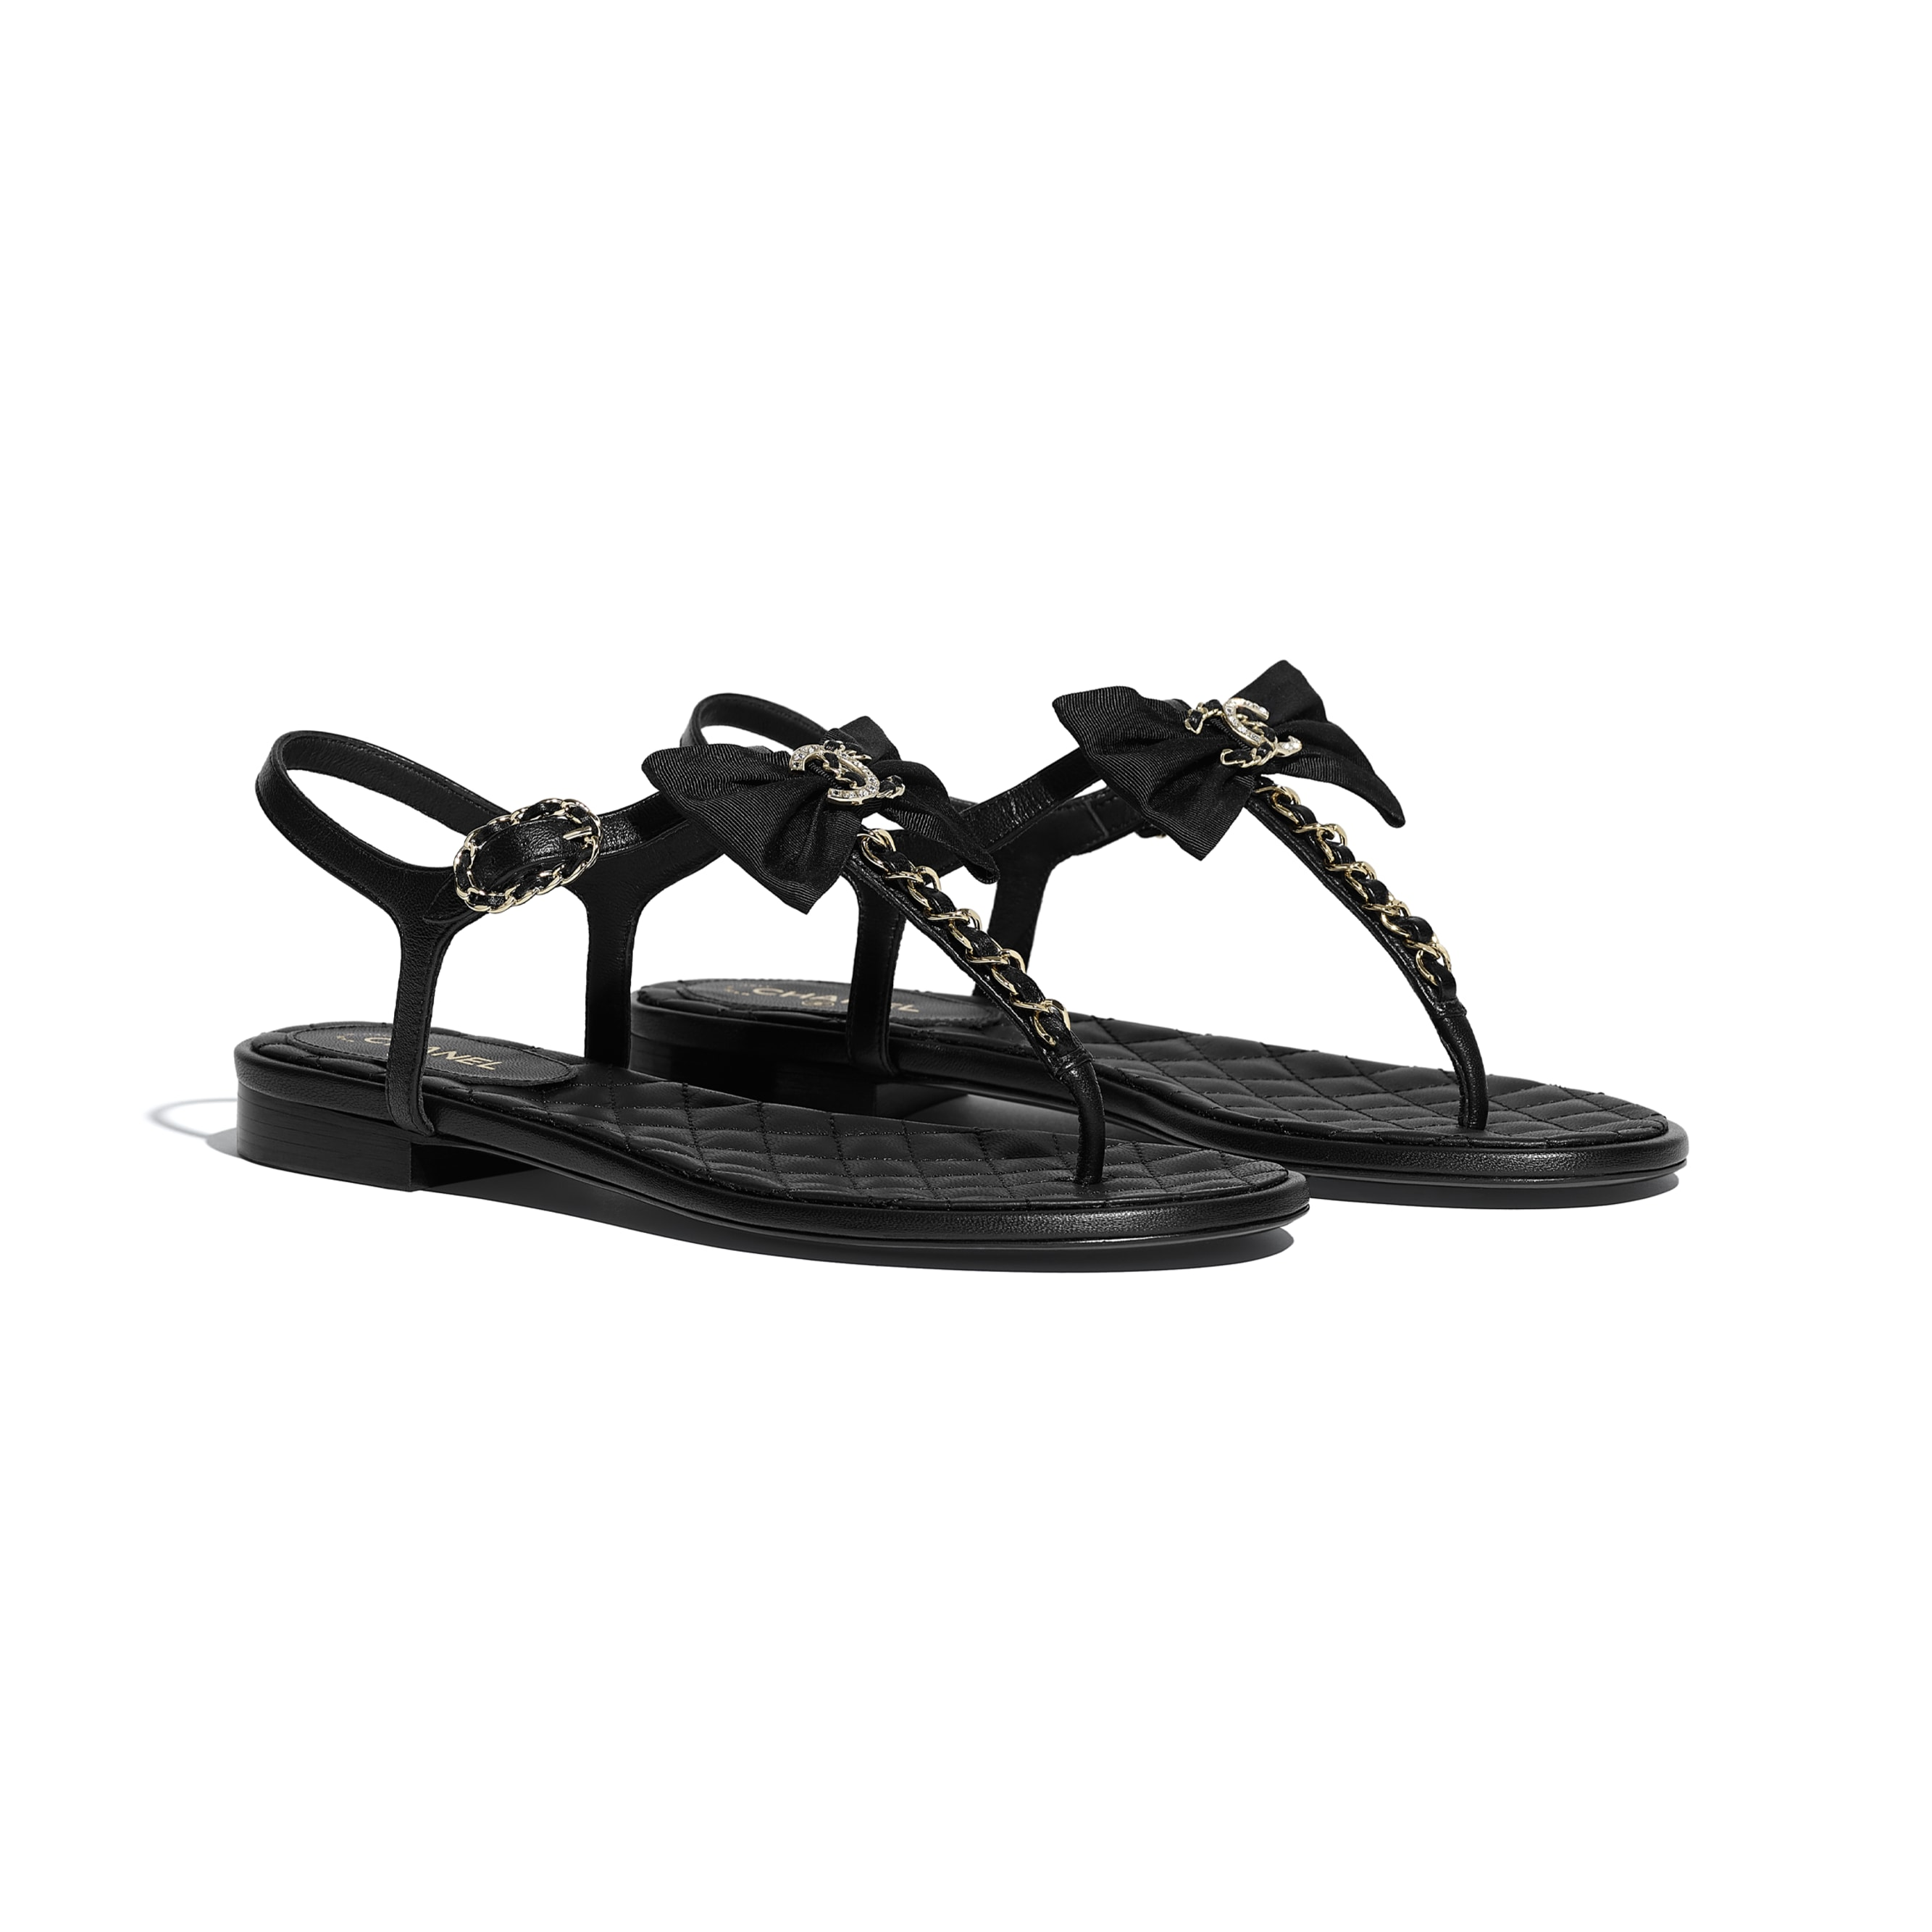 Sandálias - Black - Lambskin - CHANEL - Vista alternativa - ver a versão em tamanho standard